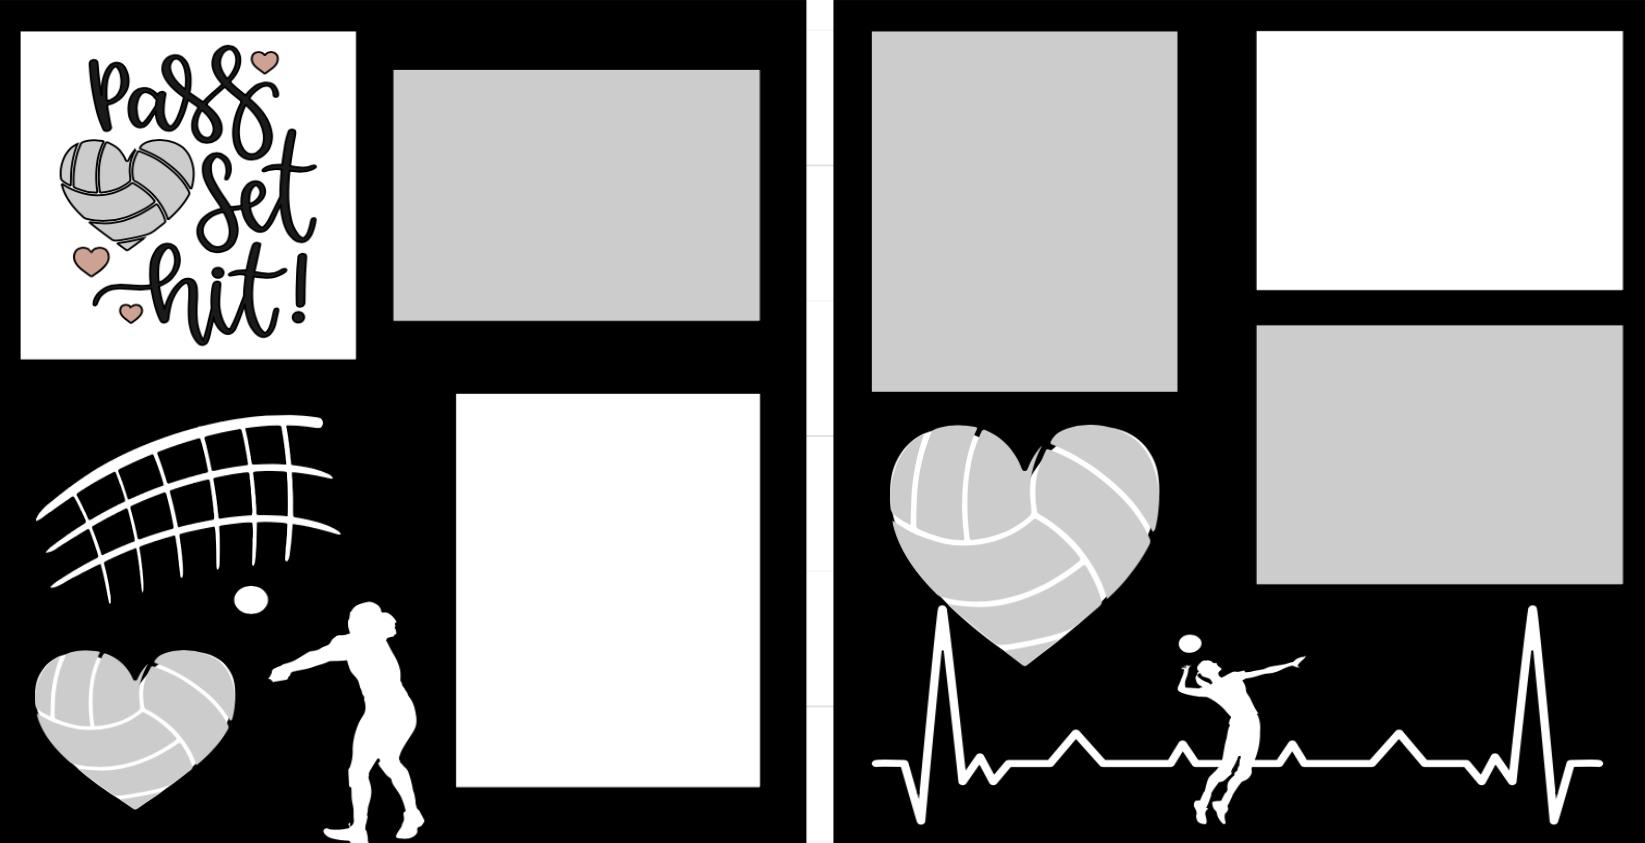 Volleyball Pass Set Hit-  page kit